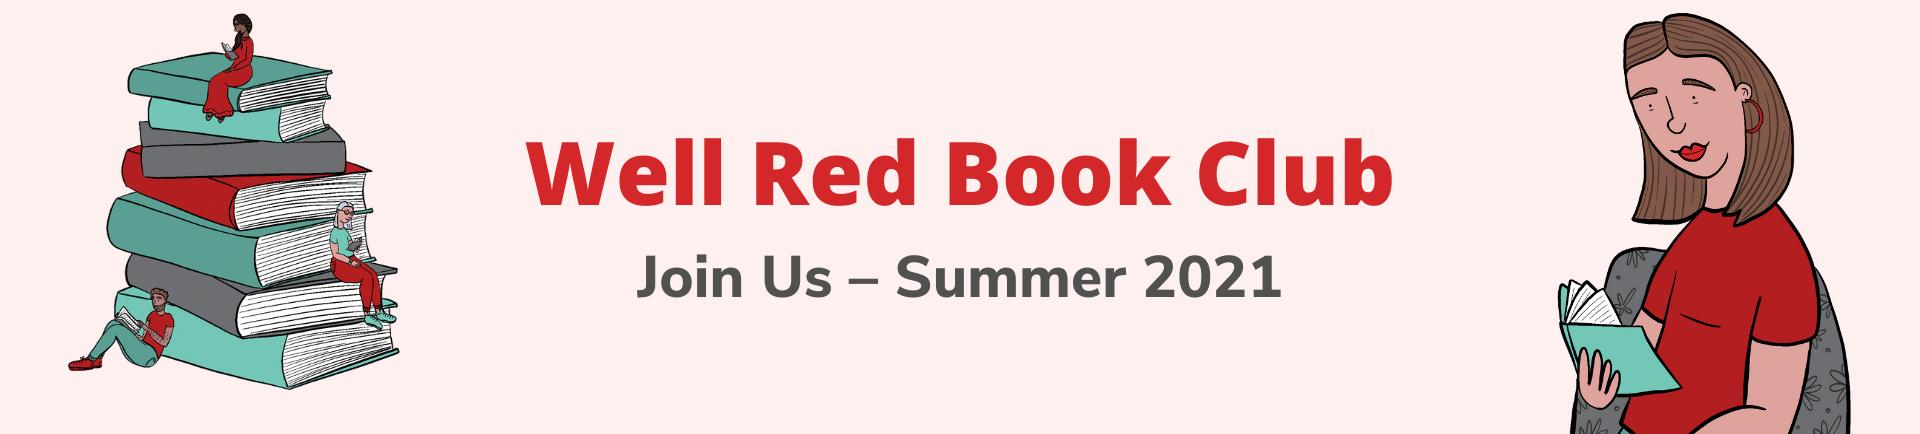 Well Red Book Club | The Period Purse Canada